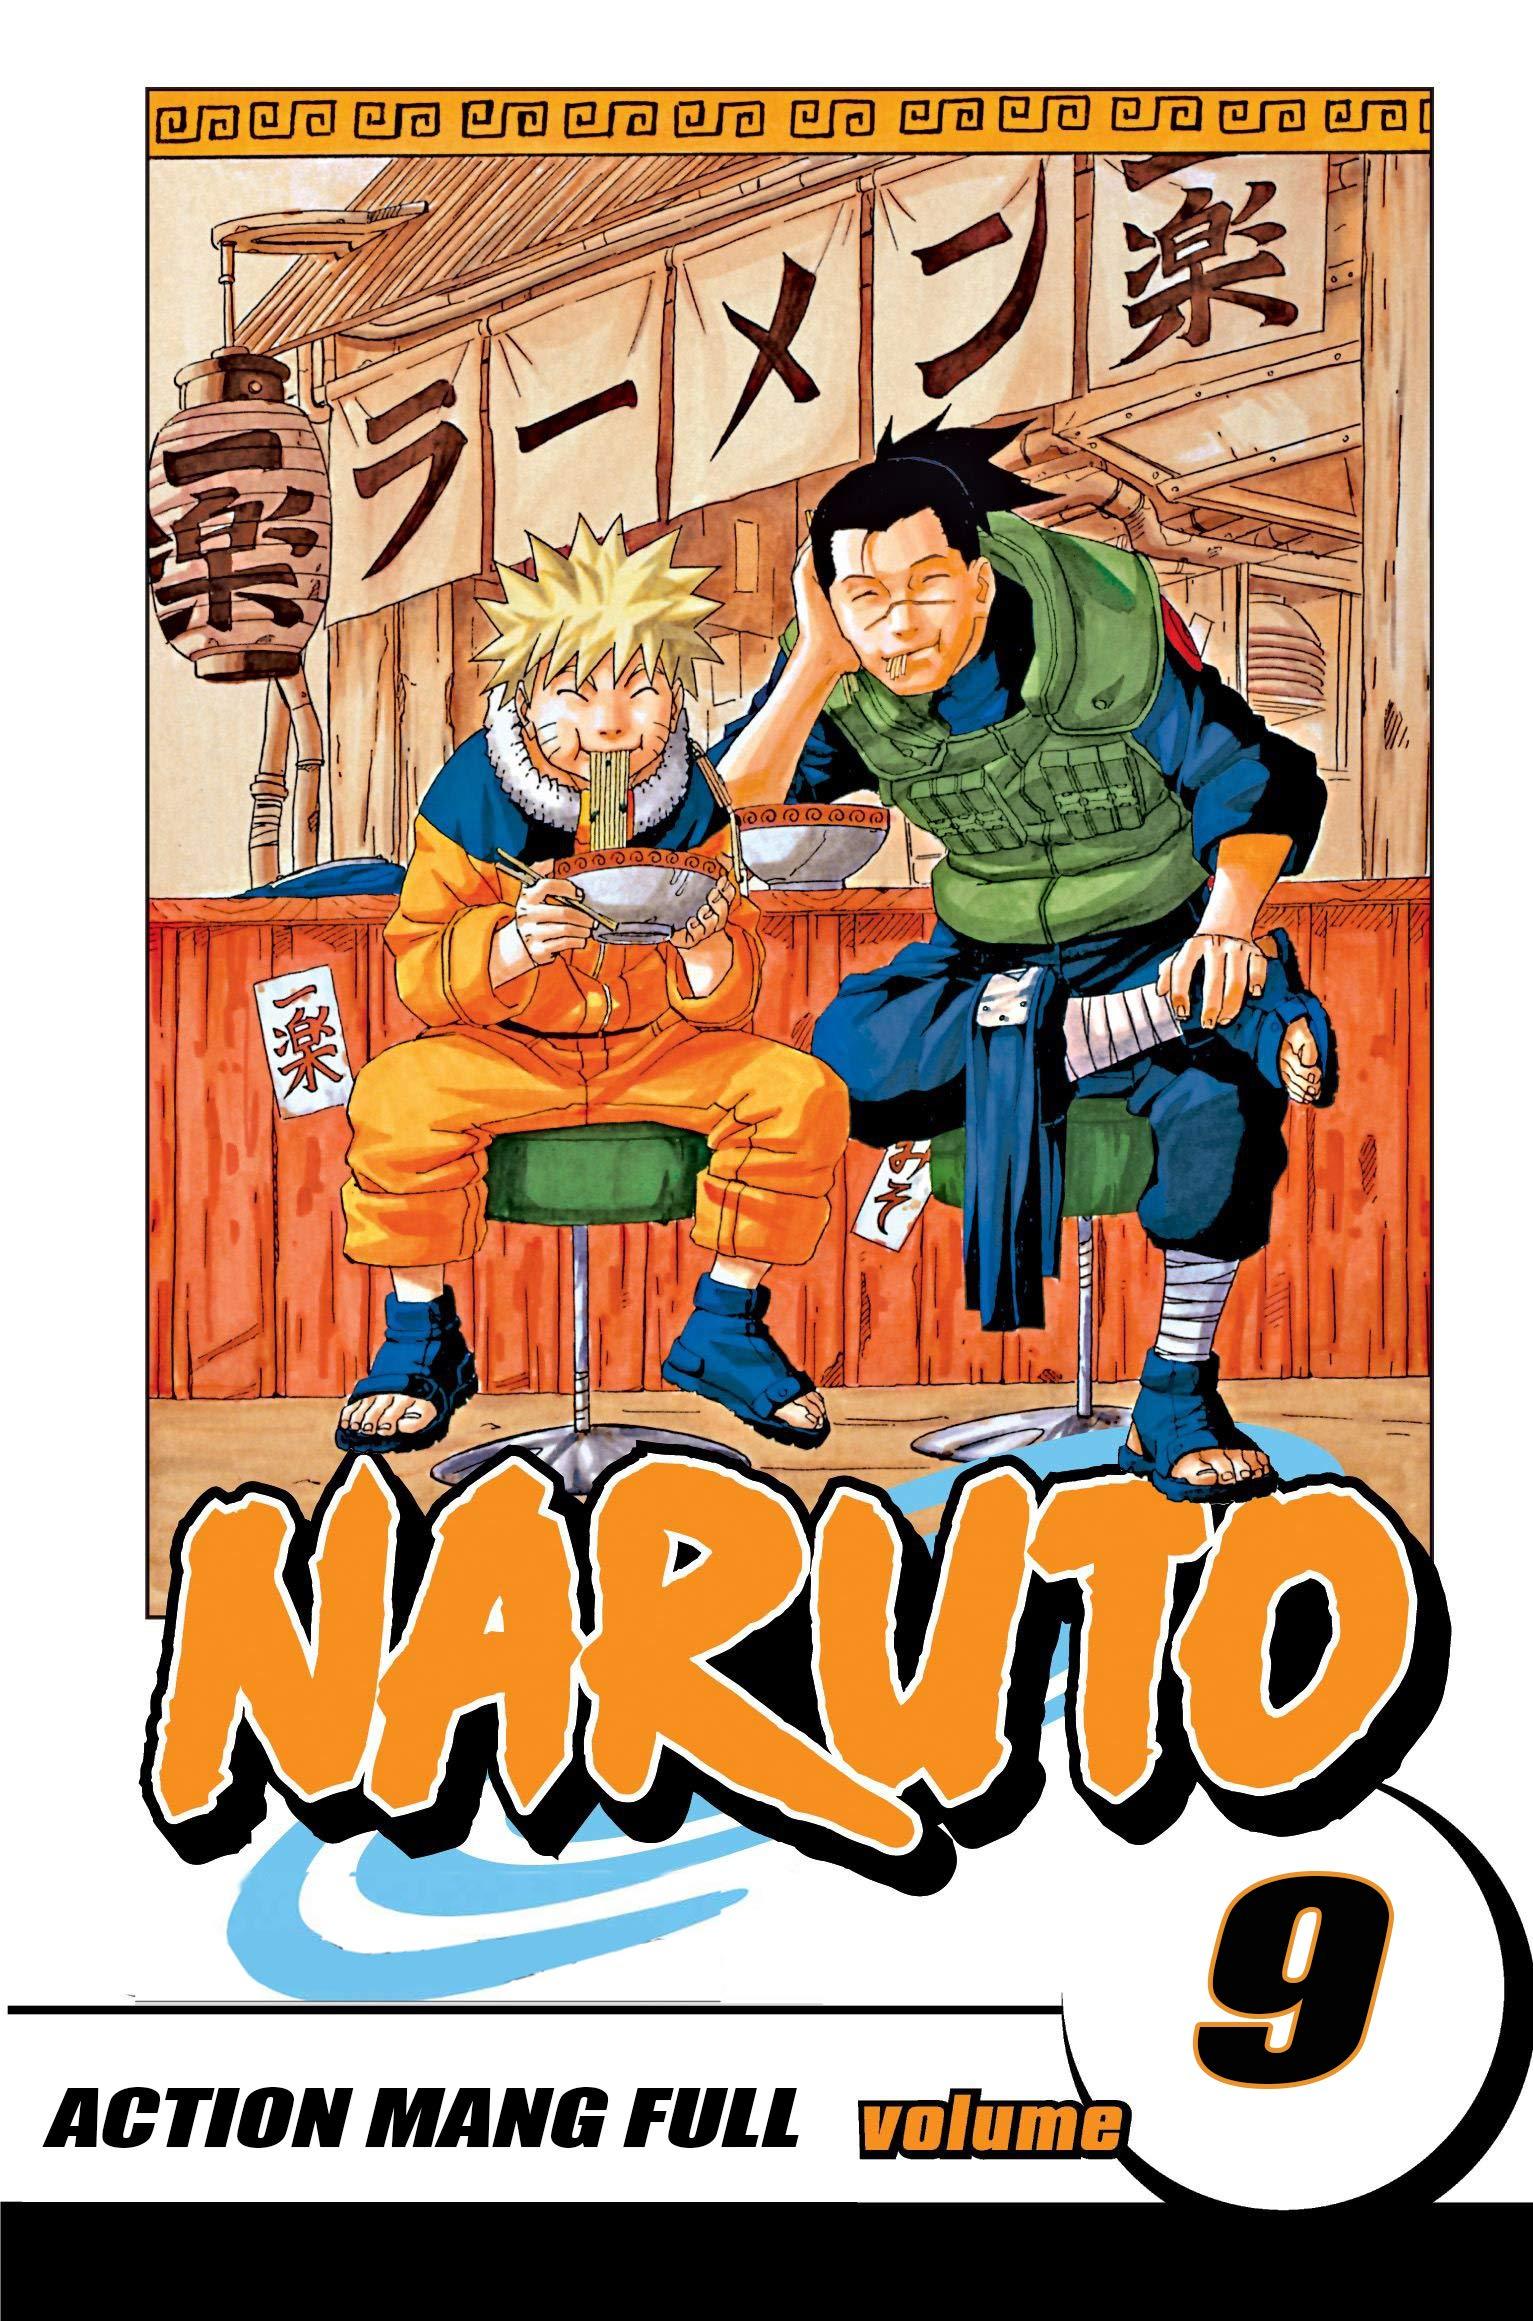 Action Manga Full Volume 9: Naruto Manga